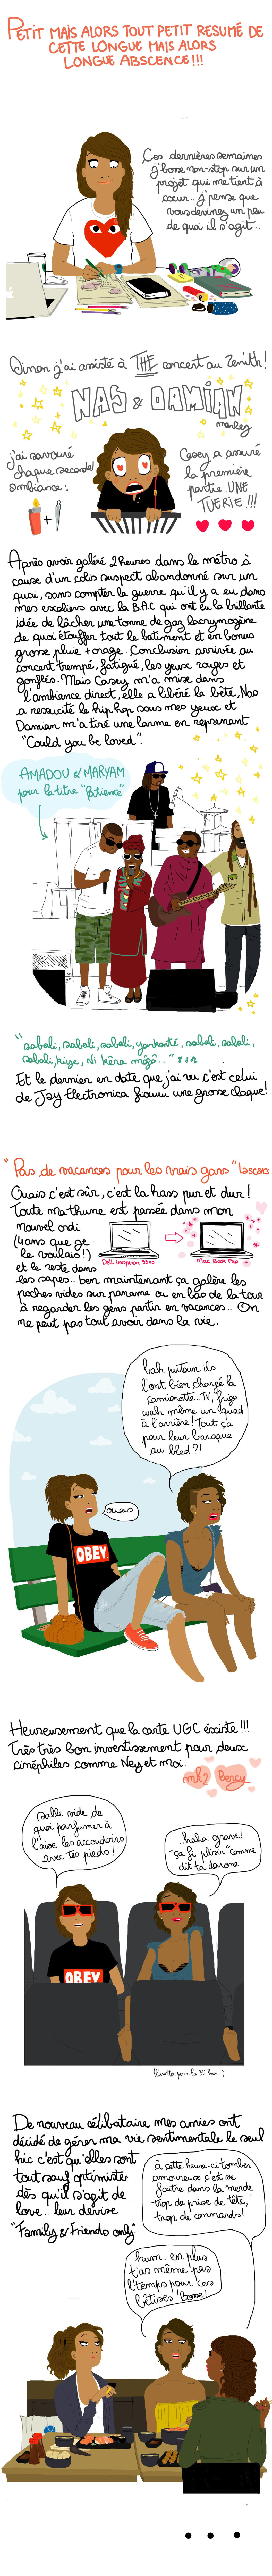 http://getfiles.free.fr/sanaa/r%e9sum%e91.jpg